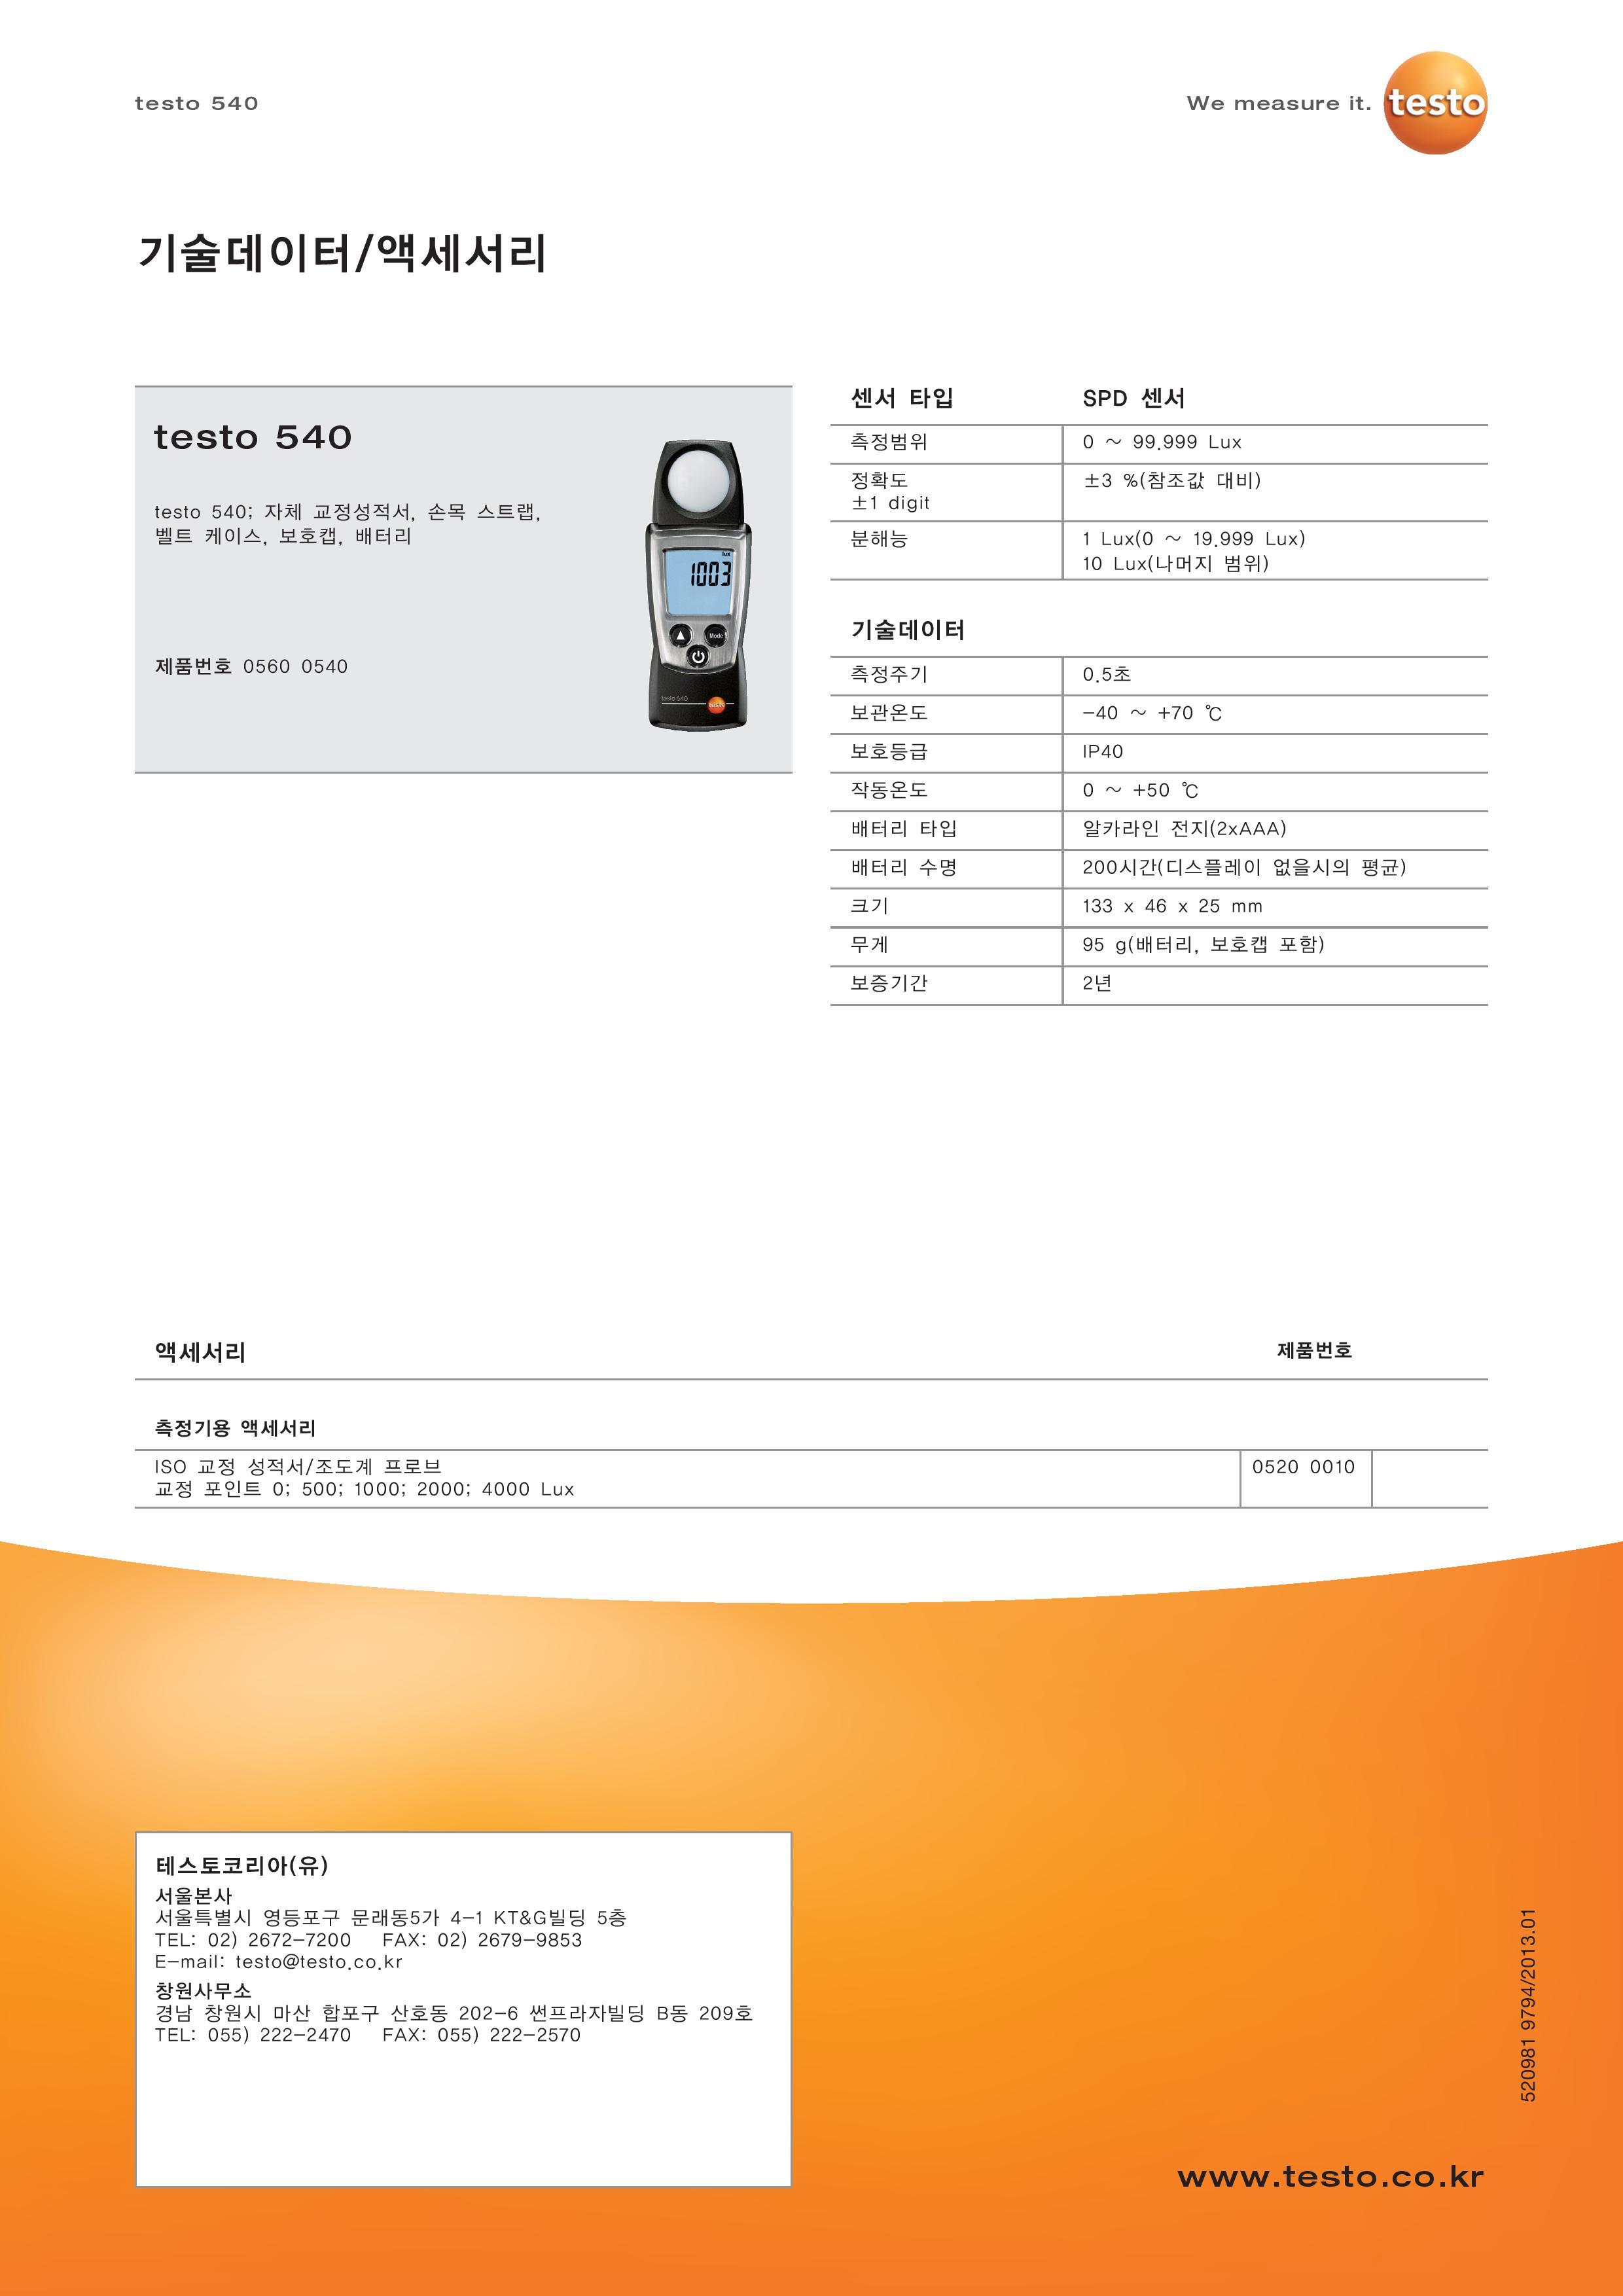 leaflet_k_testo 540-page-002.jpg